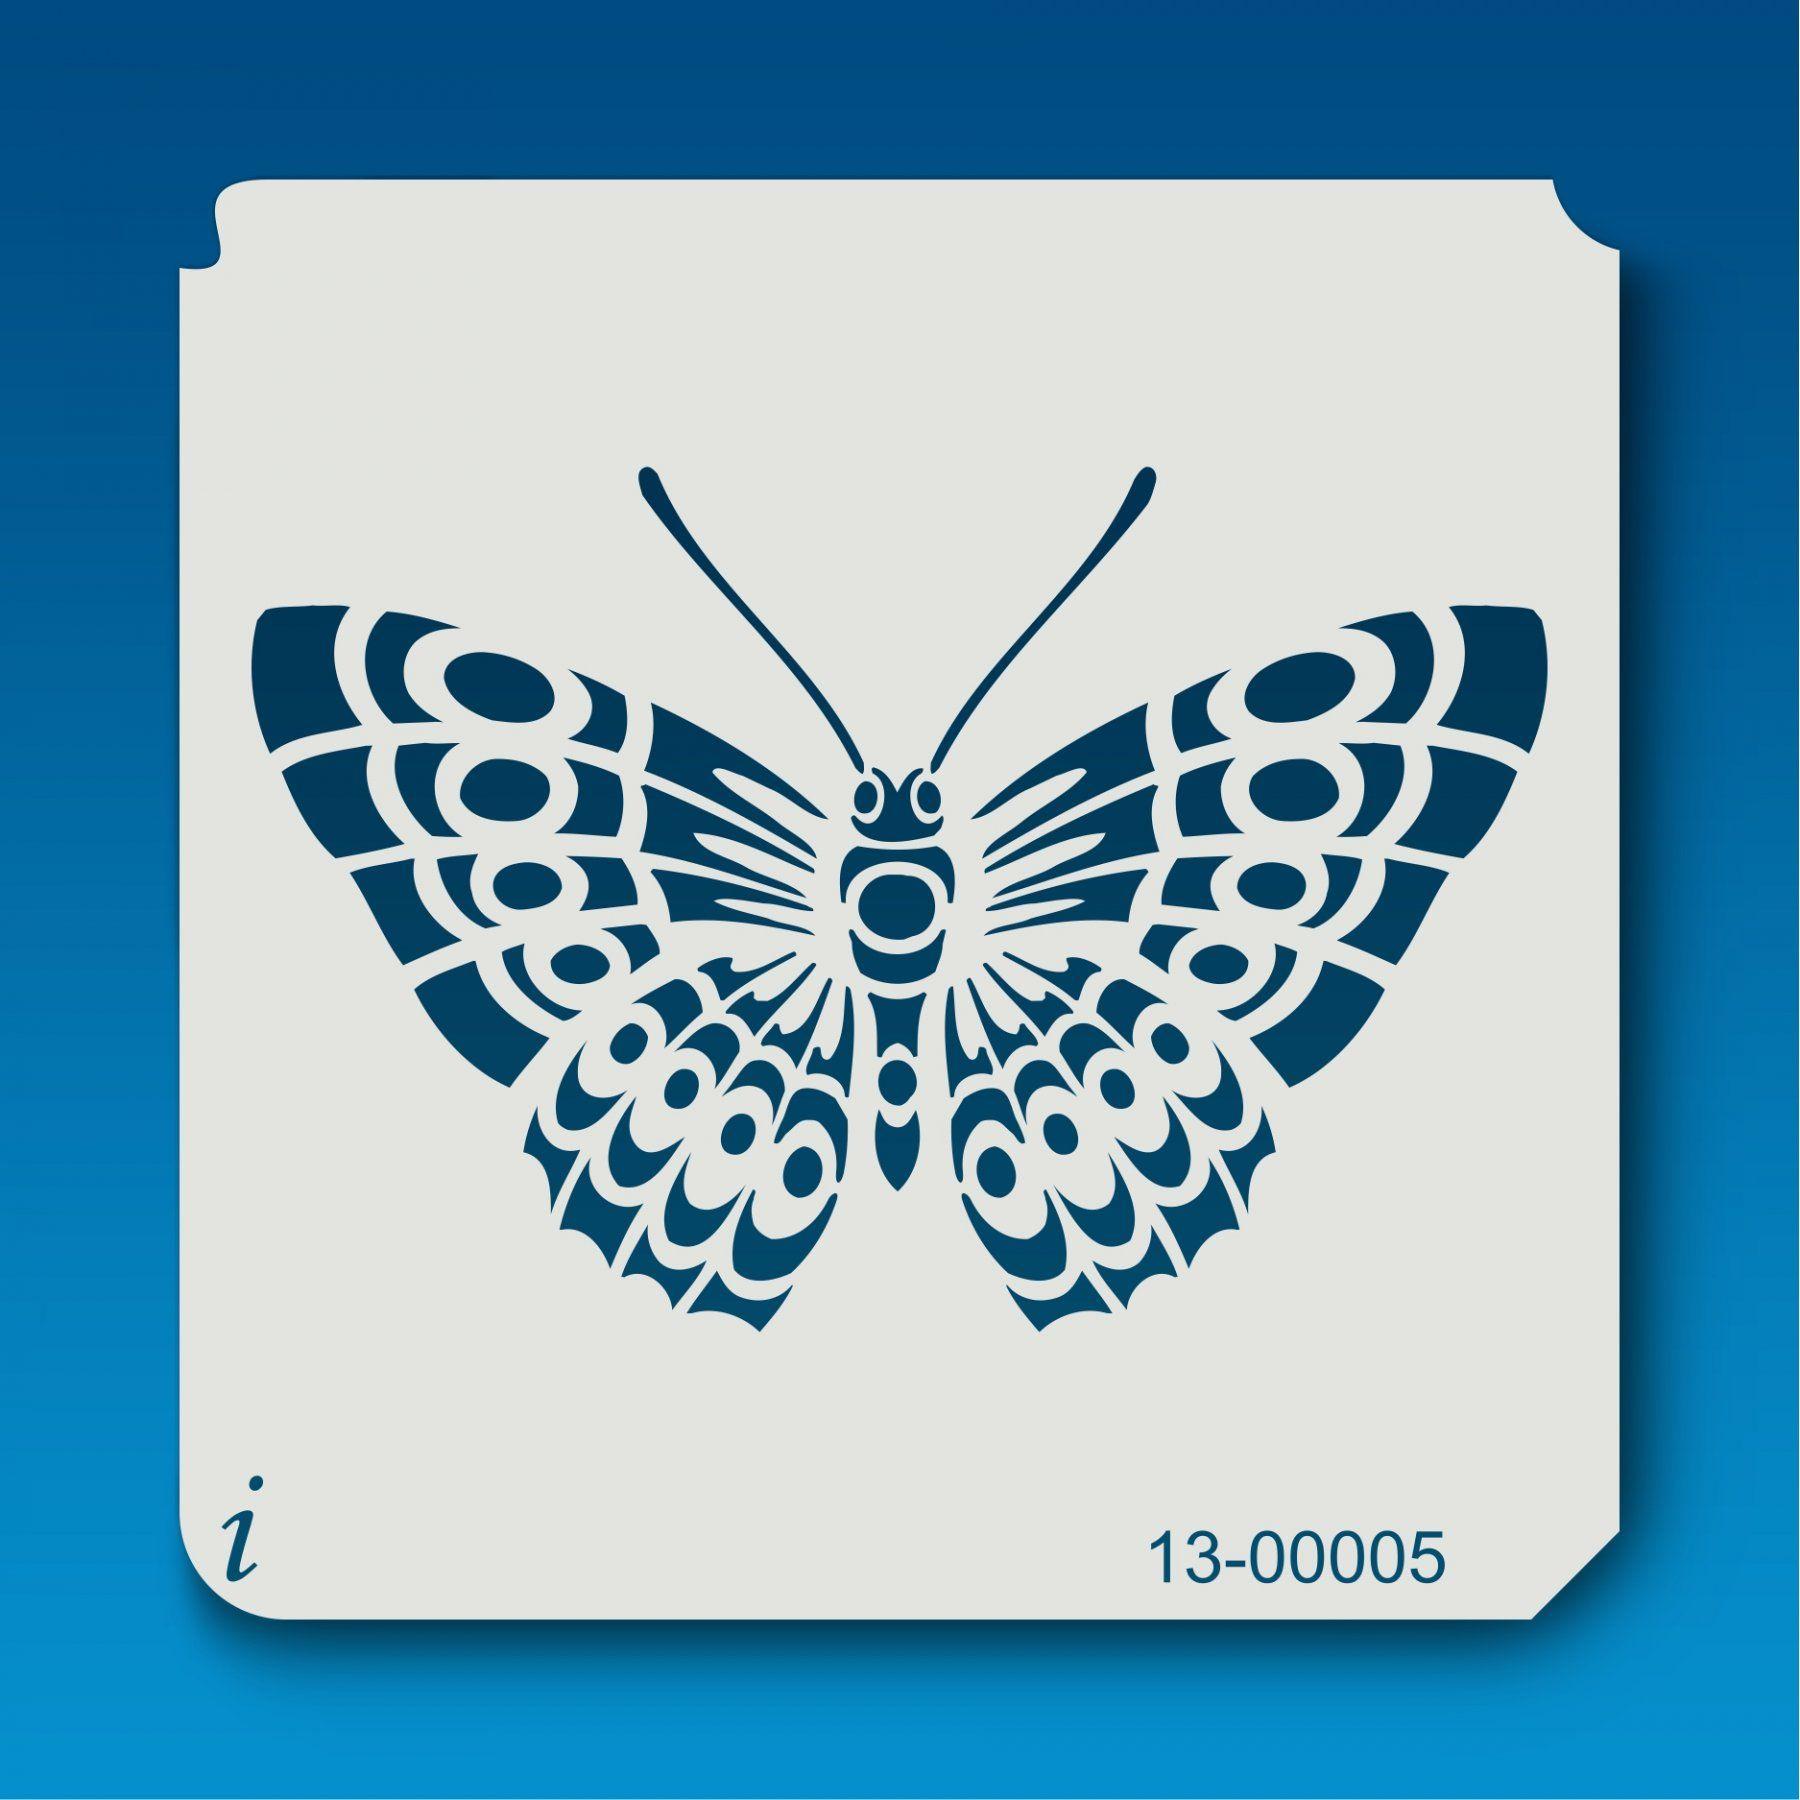 13 00005 Detailed Butterfly 1 Stencil Animal Stencil Stencil Patterns Templates Butterfly Stencil